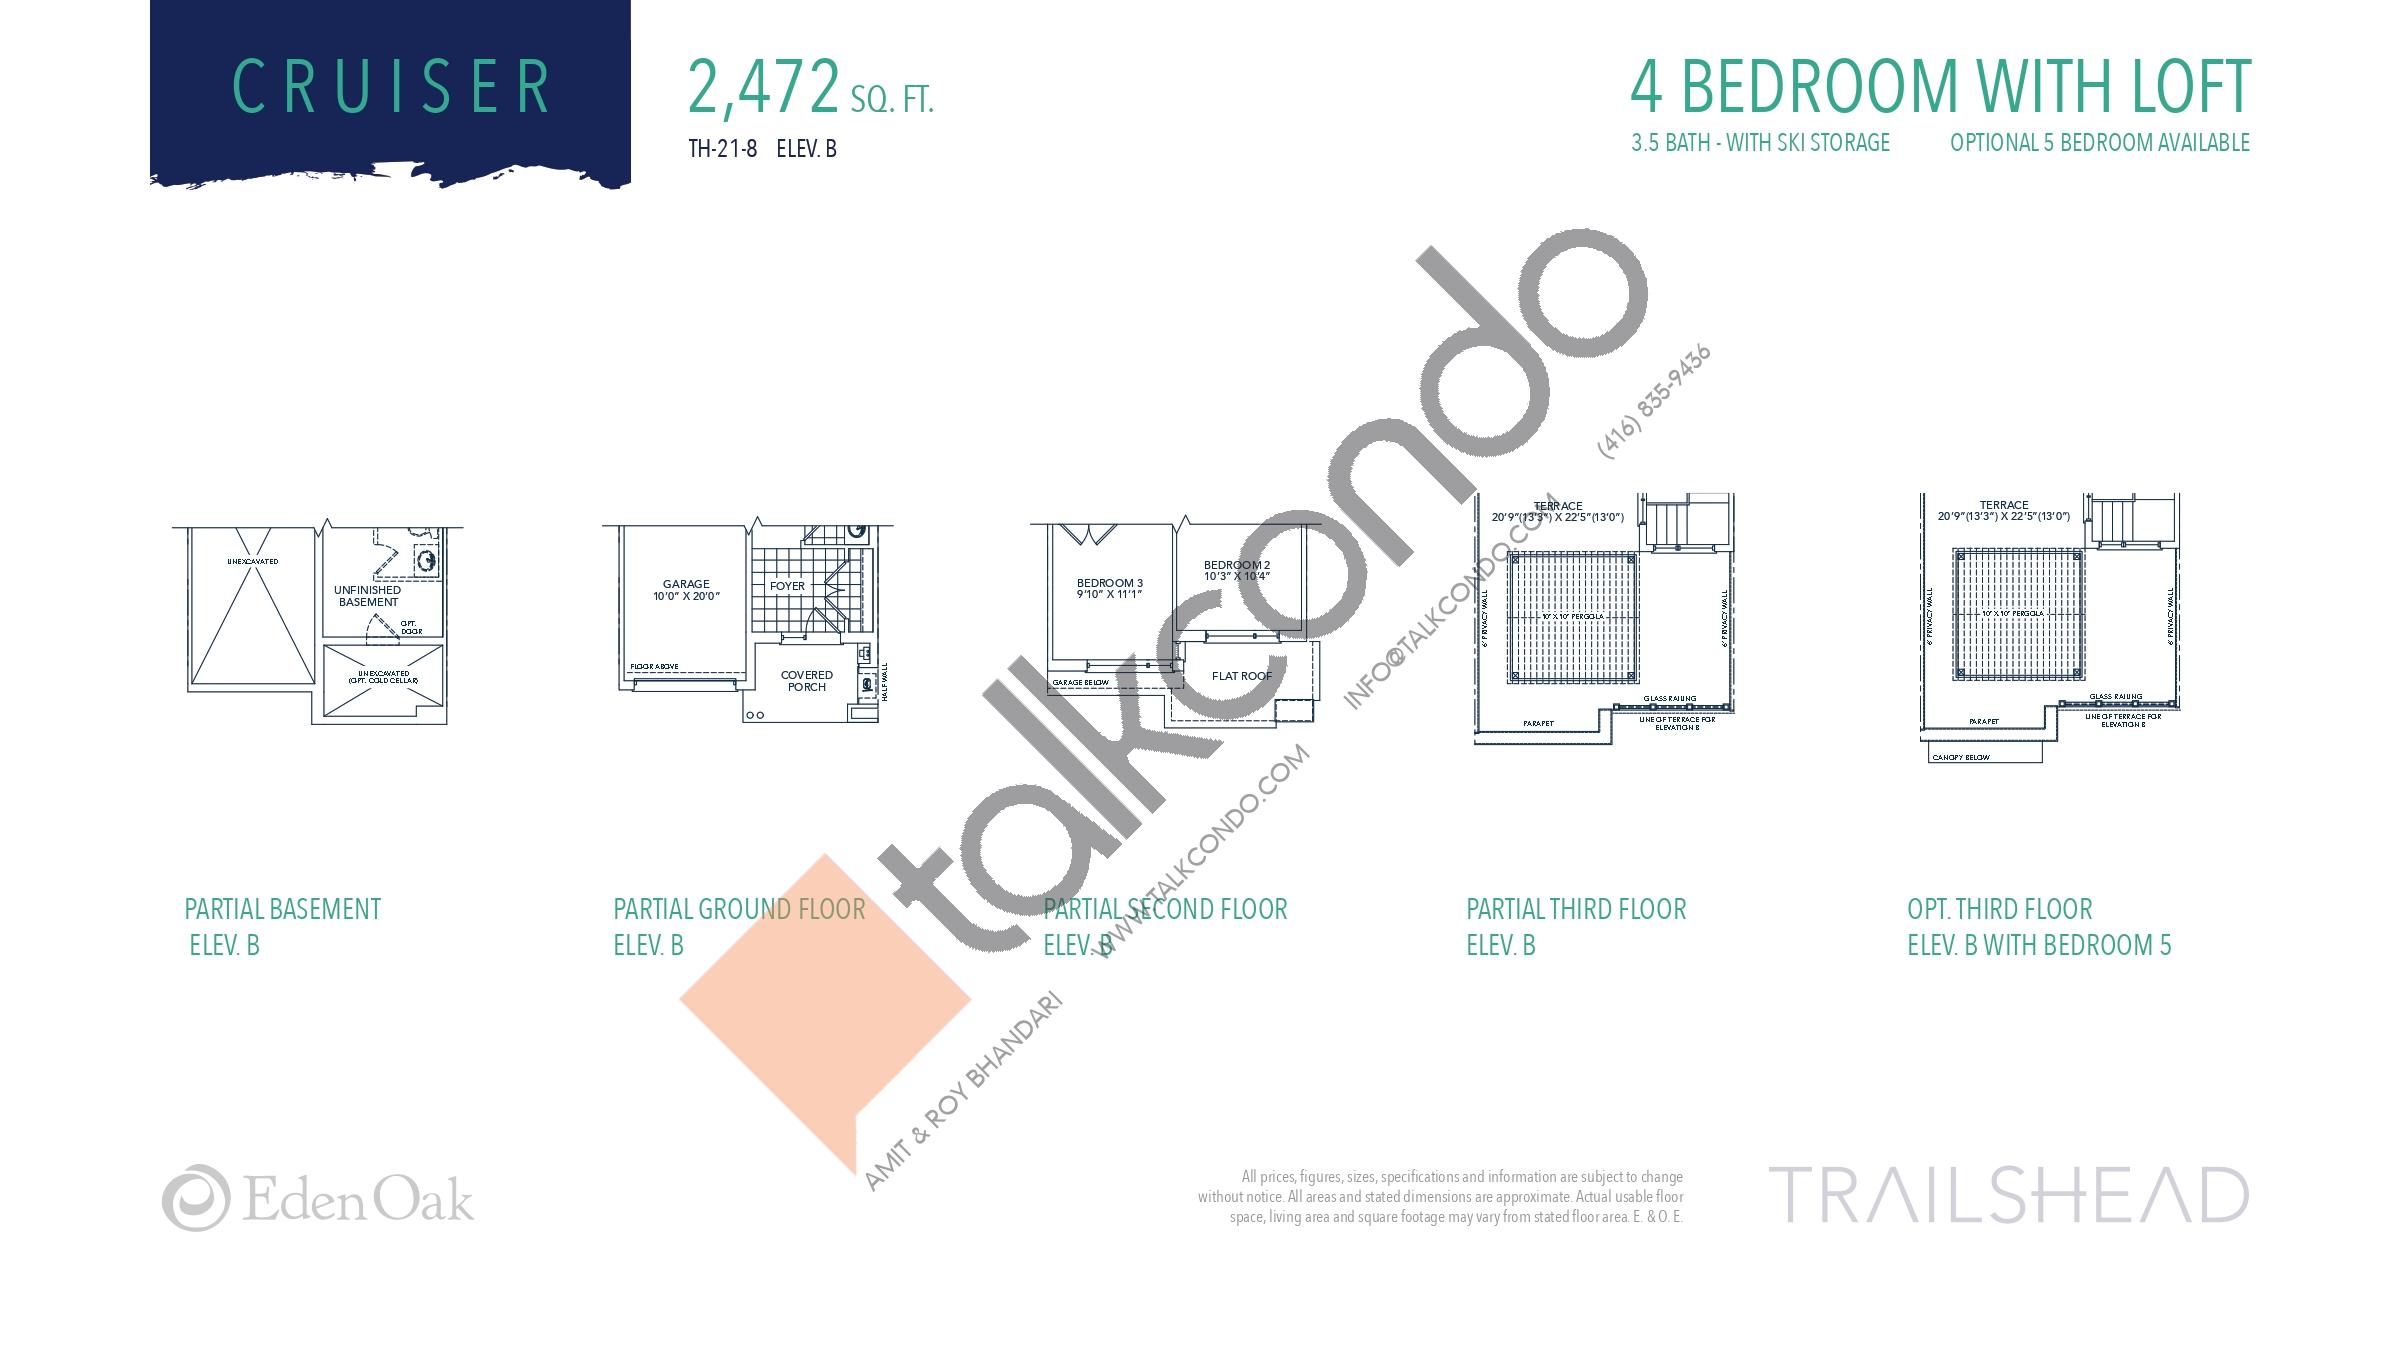 Cruiser (2/2) Floor Plan at Trailshead Towns - 2472 sq.ft